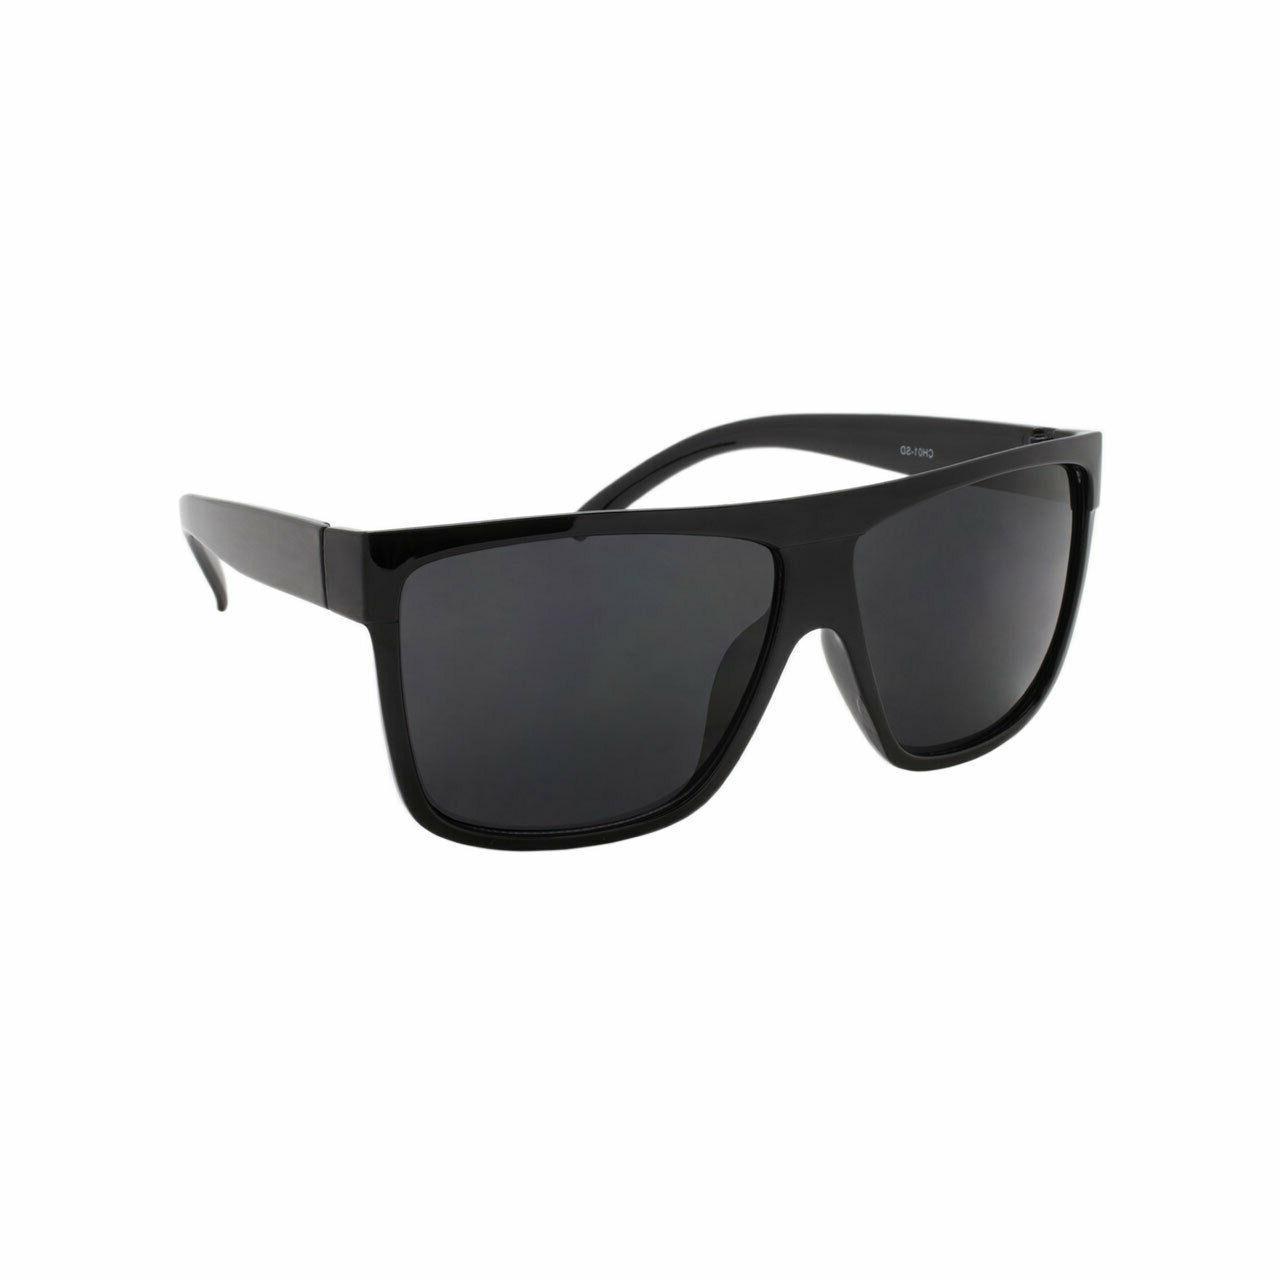 OG Top All Black Style Sunglass Biker Style Gangster